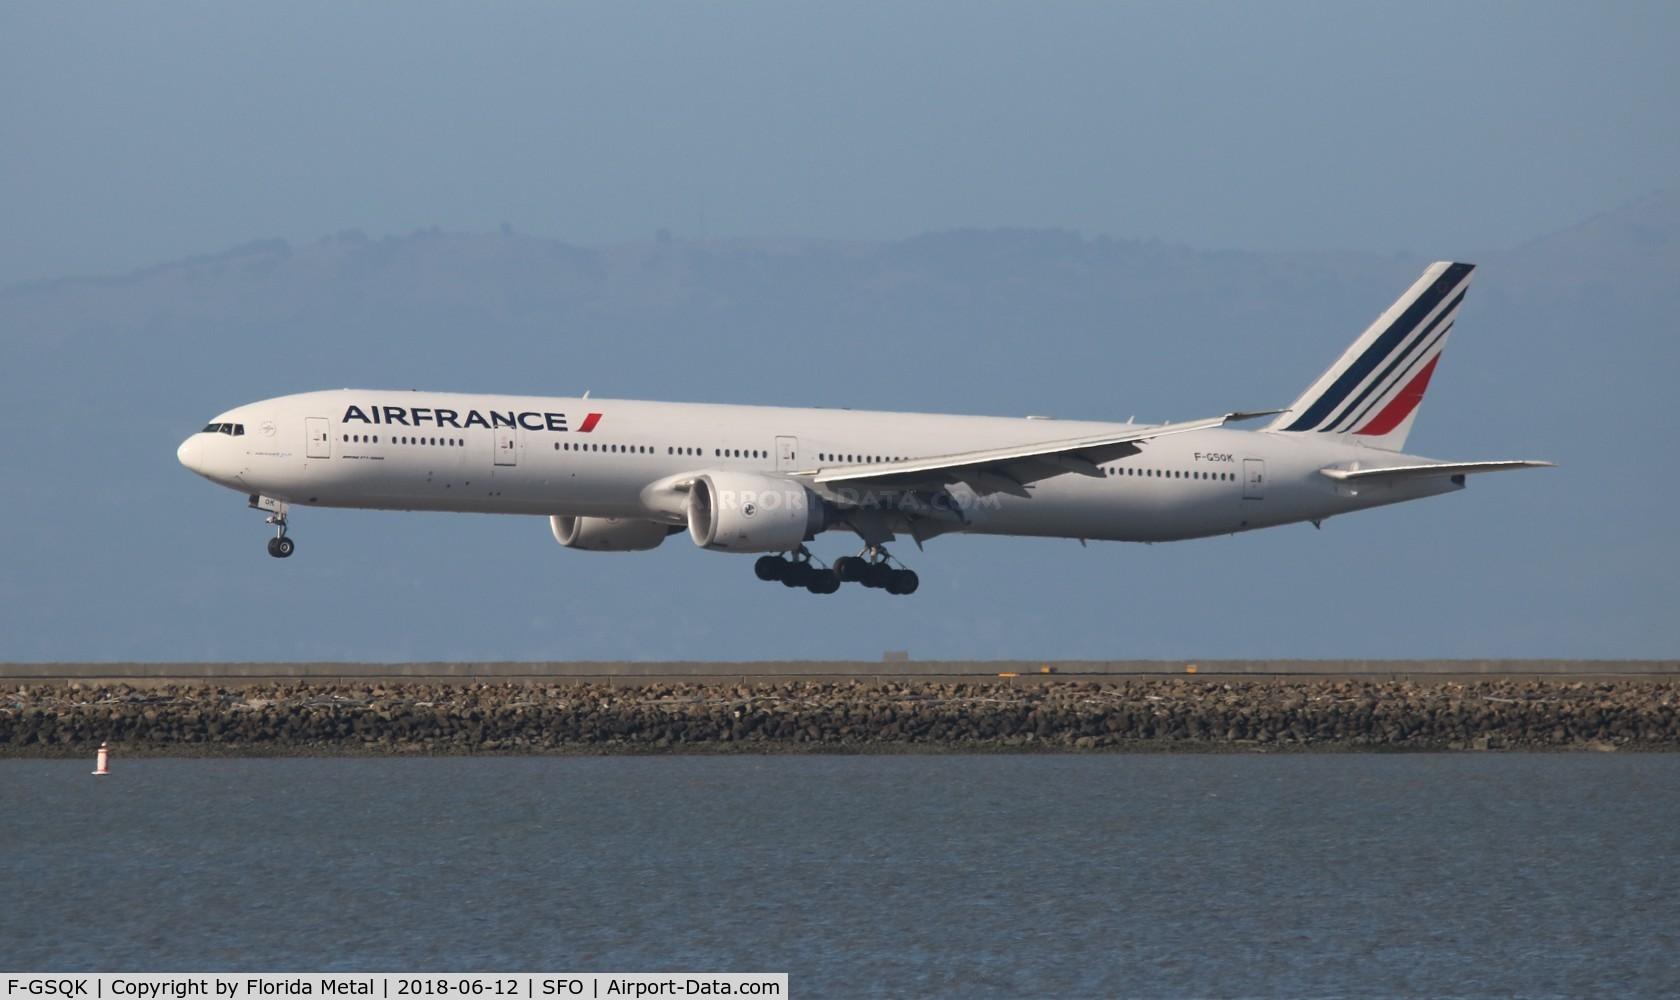 F-GSQK, 2005 Boeing 777-328/ER C/N 32845, Air France